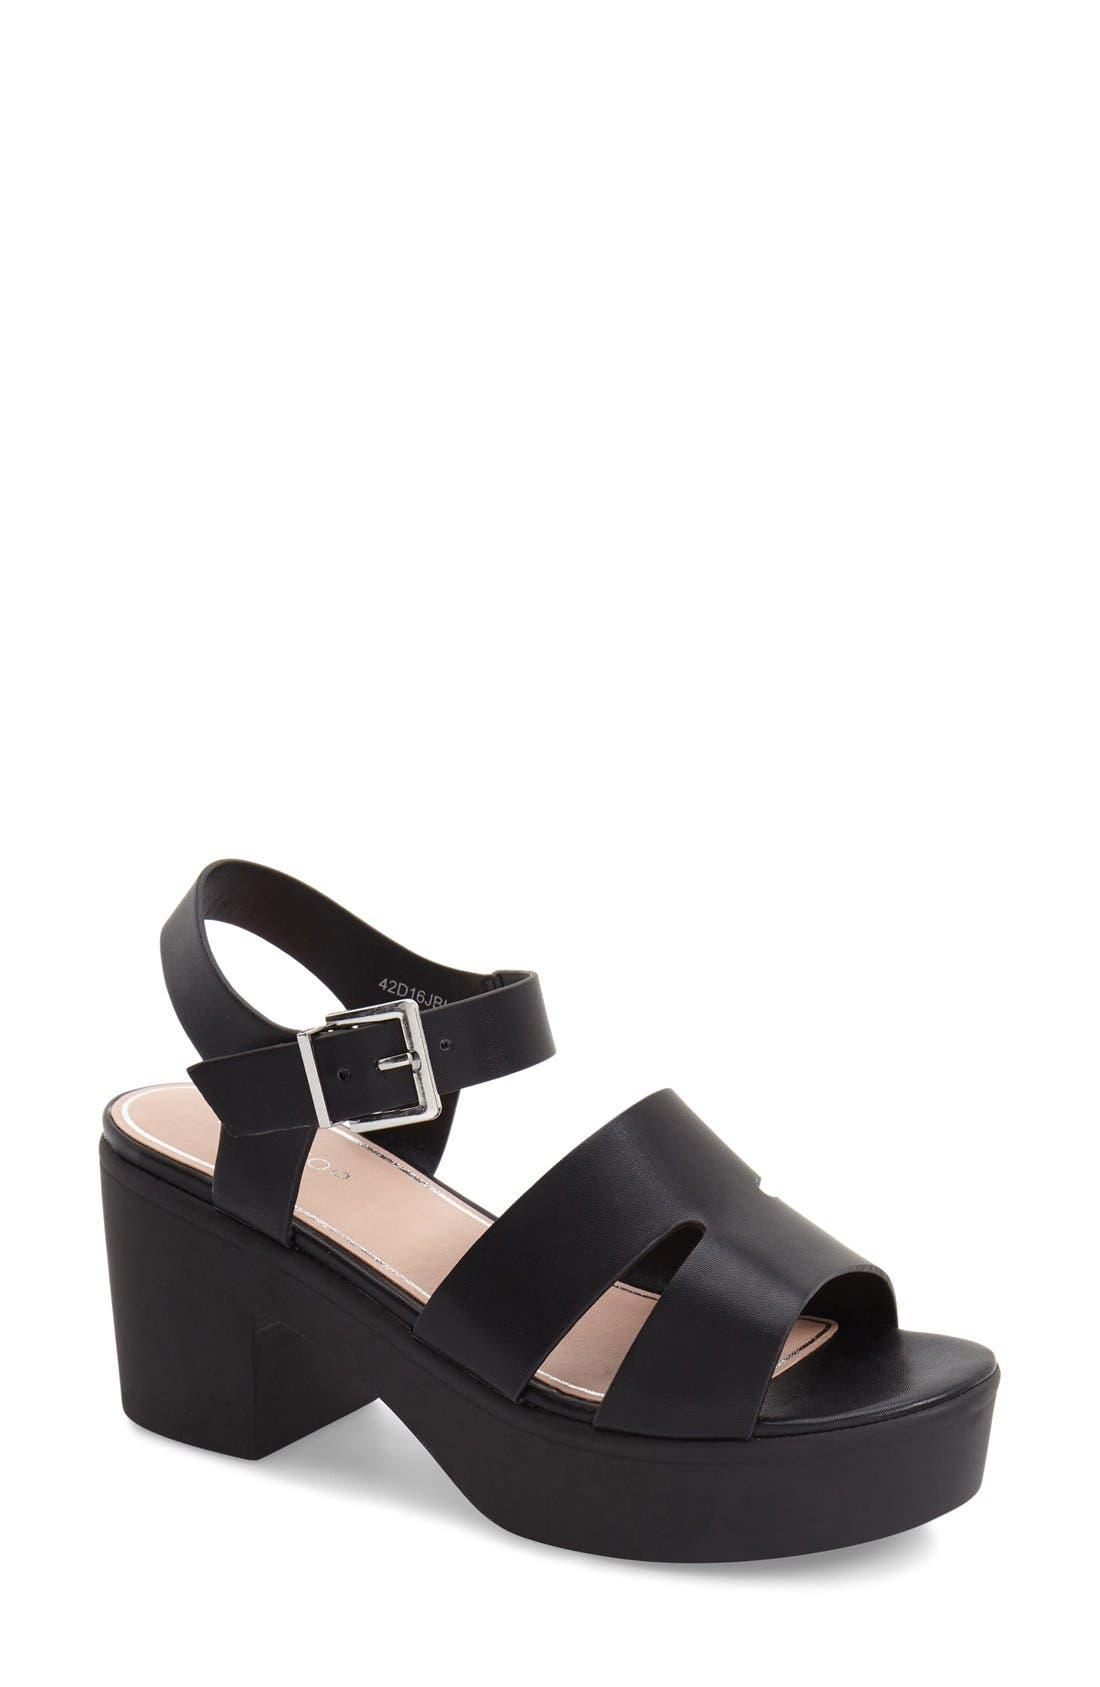 Main Image - Topshop 'Den' Platform Sandal (Women)